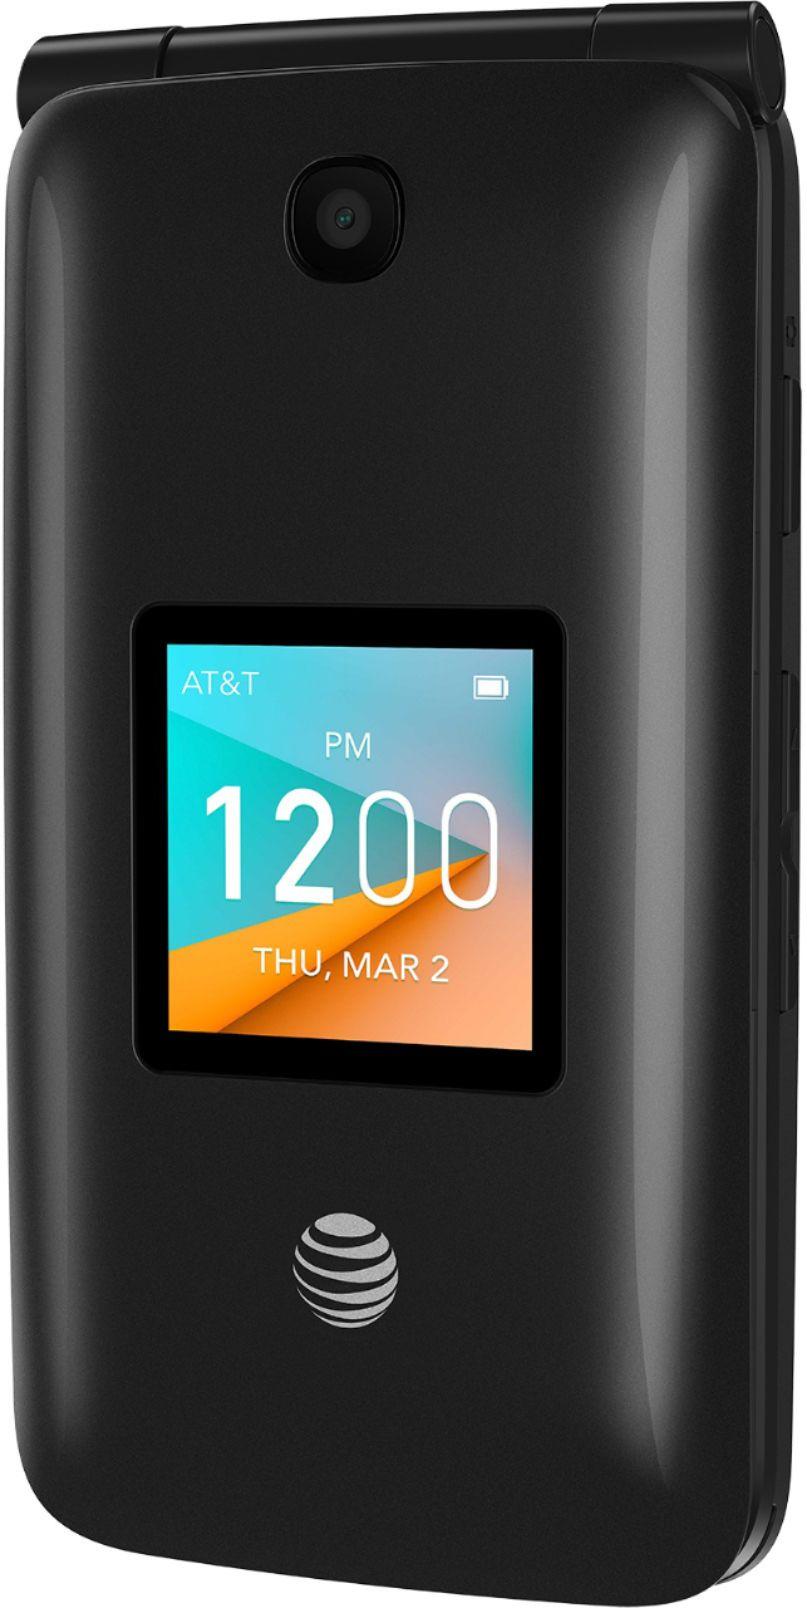 AT&T Prepaid Alcatel Cingular Flip 2 with 4GB Memory Prepaid Cell Phone Dark Gray 4044O - Best Buy $2